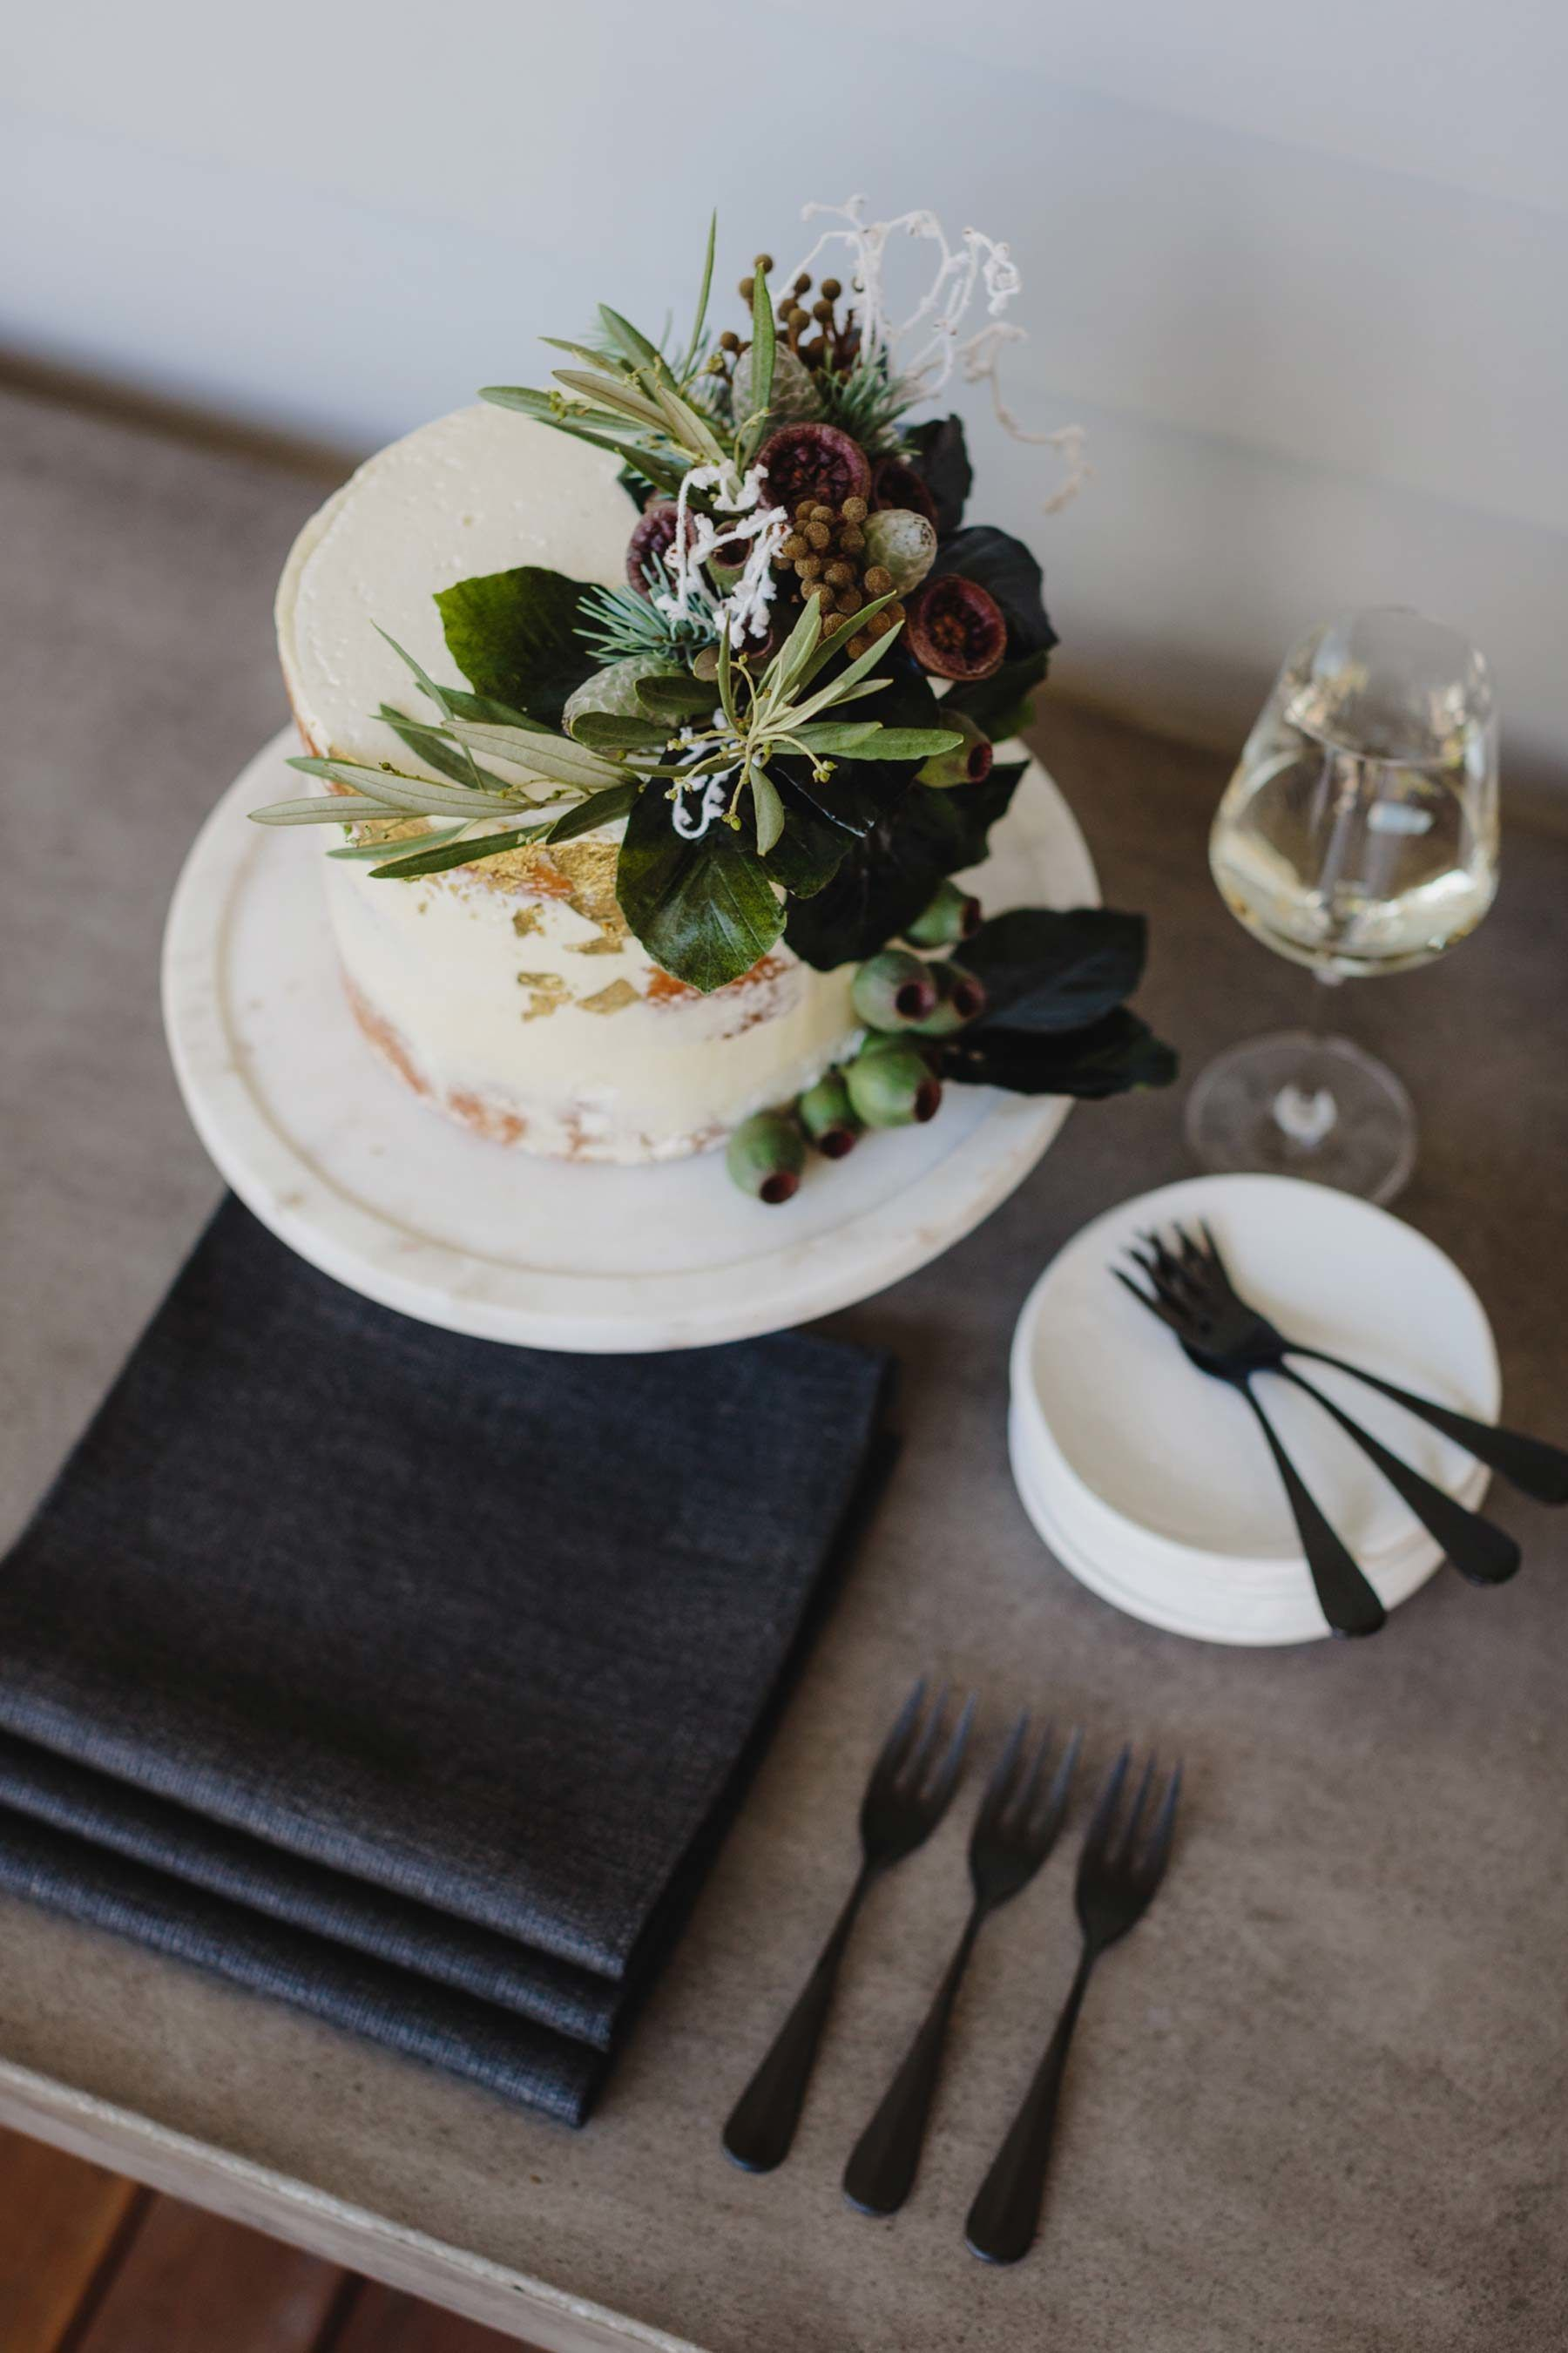 A Festive Summer Lunch with a Modern Australiana Theme